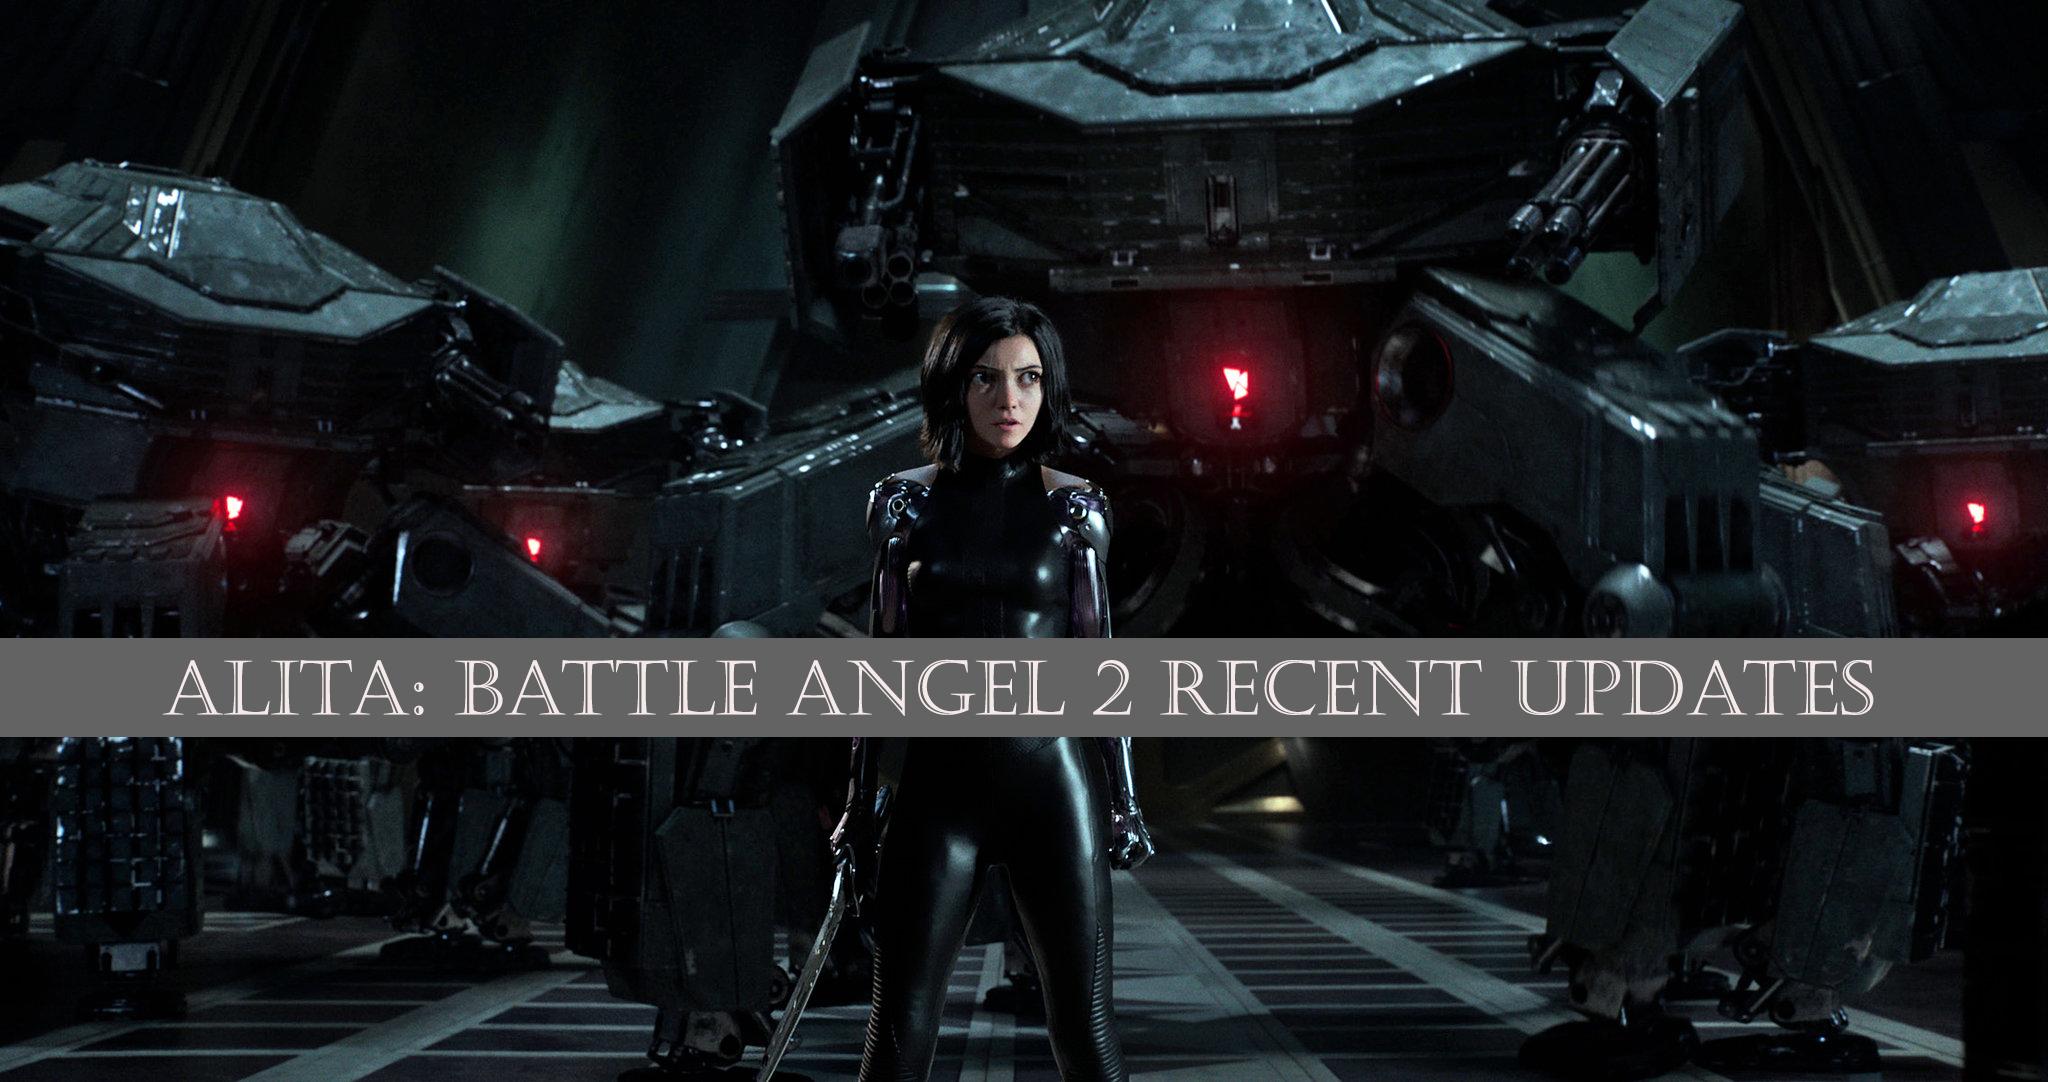 Alita: Battle Angel 2 All Latest Updates